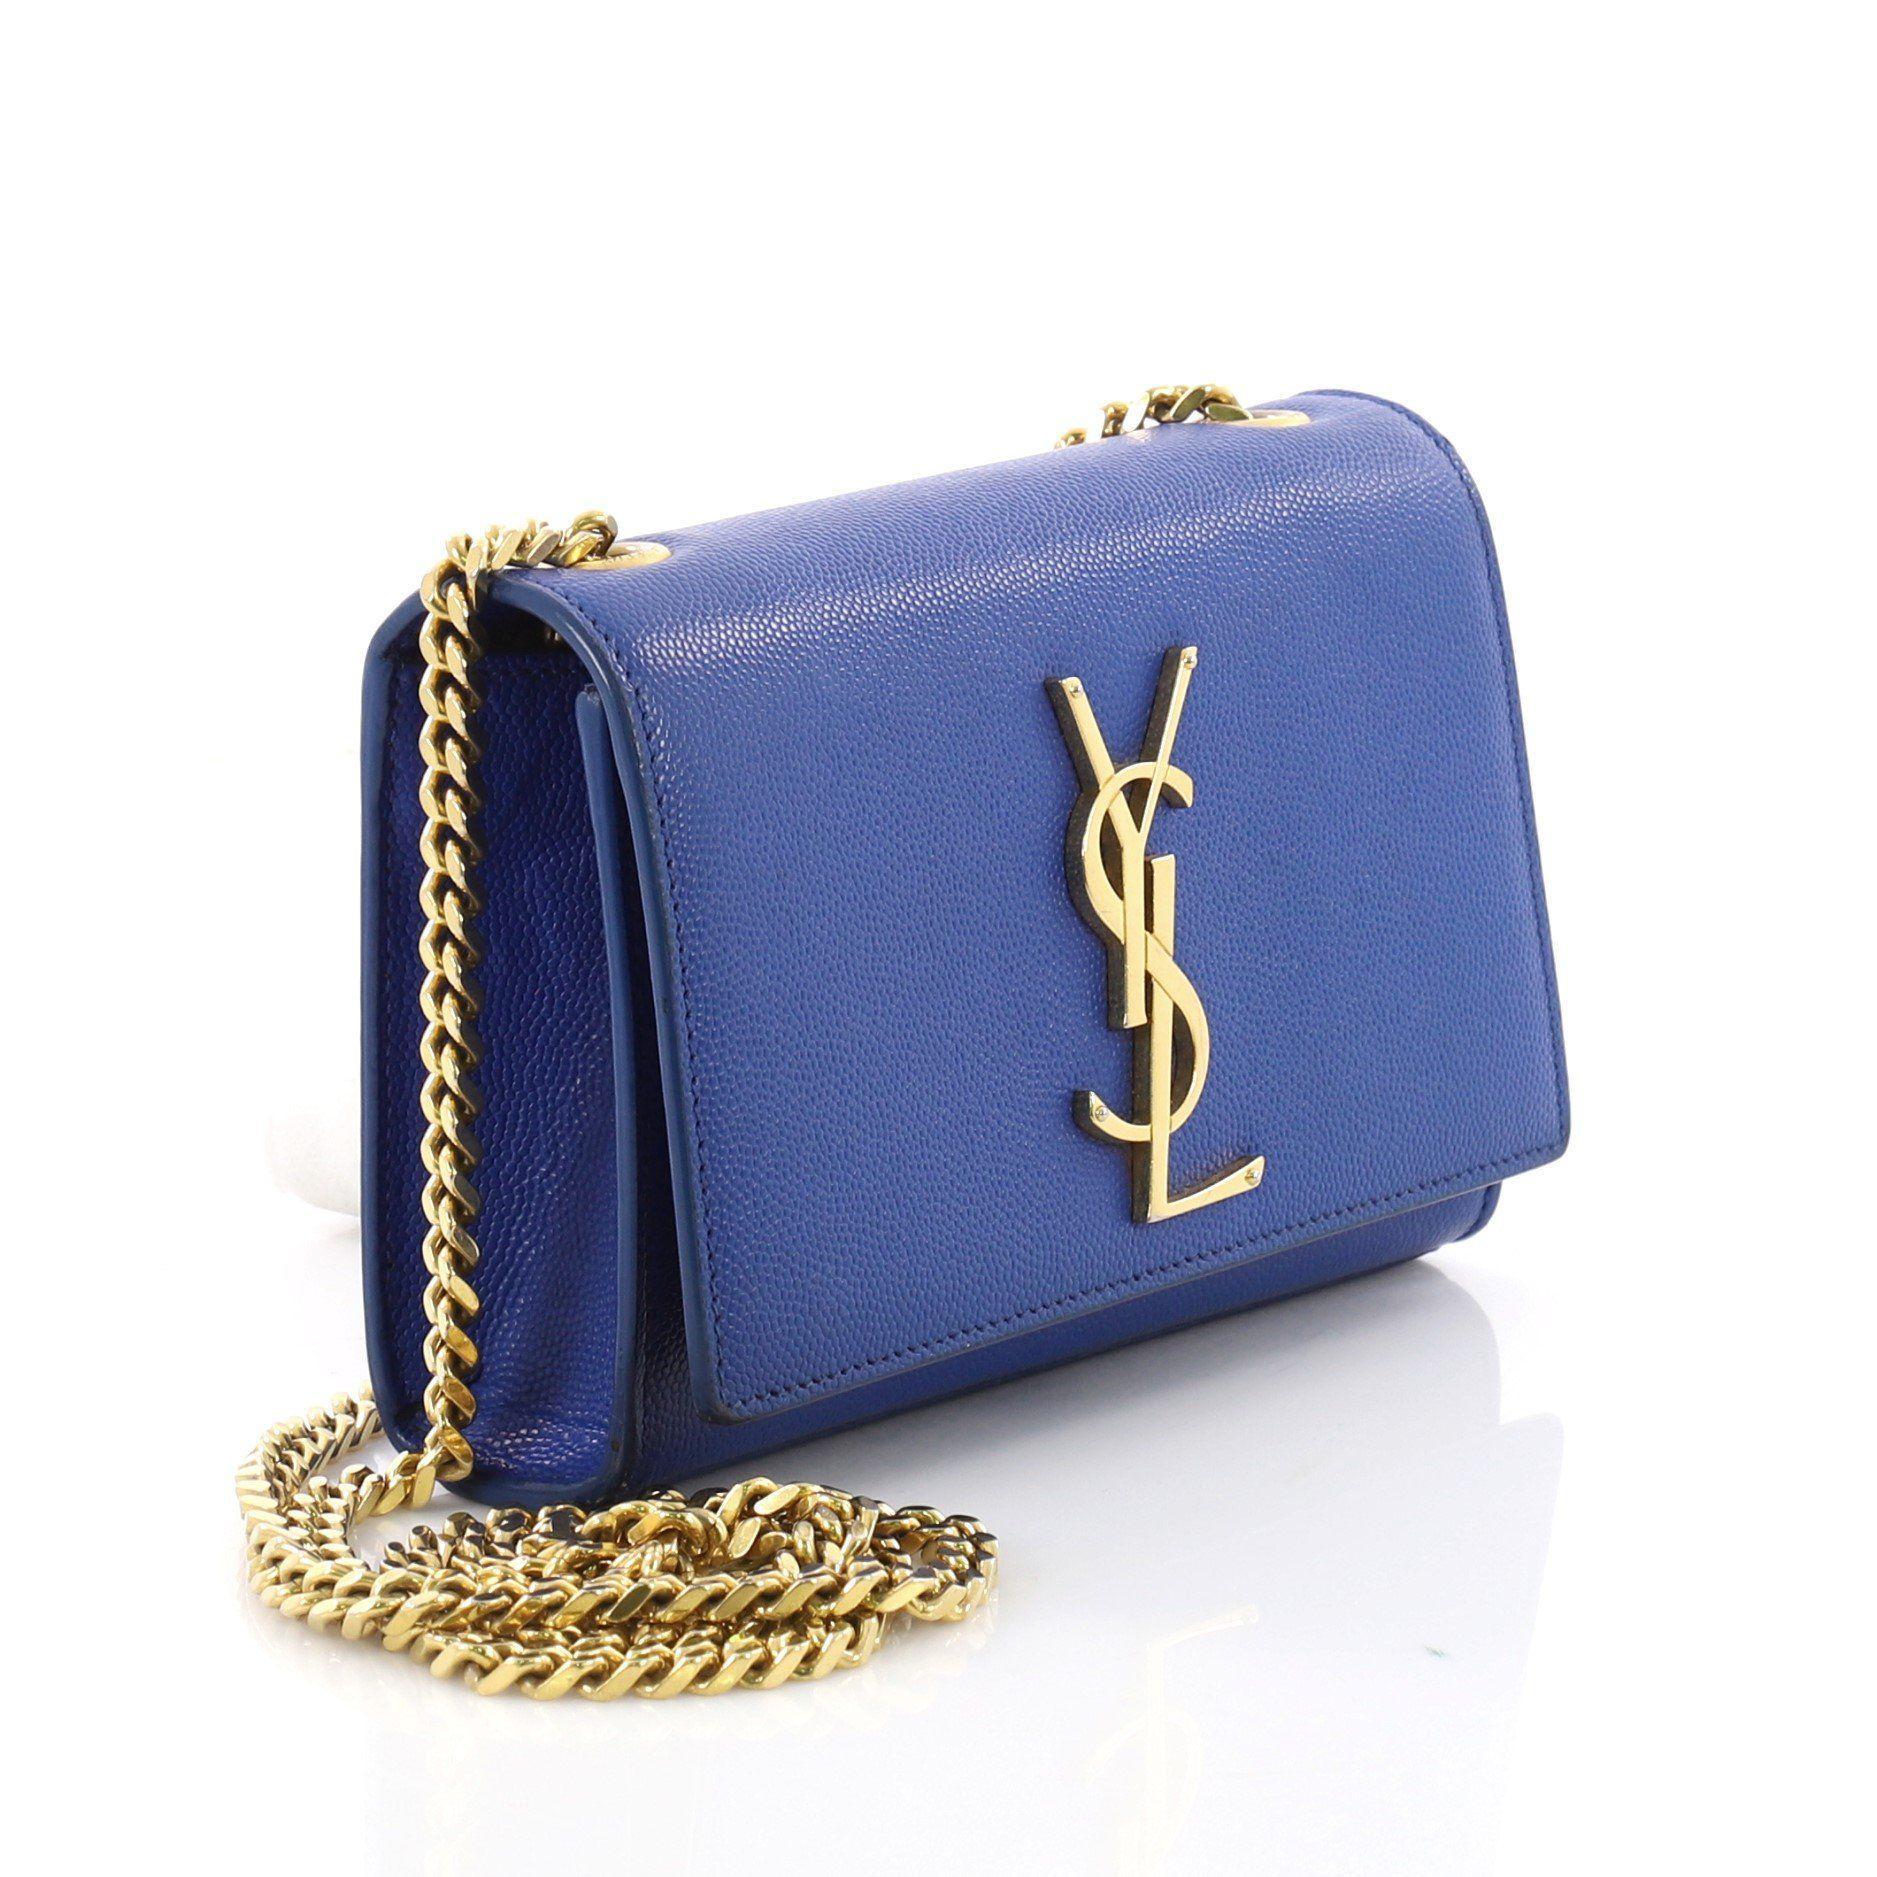 a58b127c392b Saint Laurent - Blue Pre Owned Classic Monogram Crossbody Bag Grainy  Leather Small - Lyst. View fullscreen